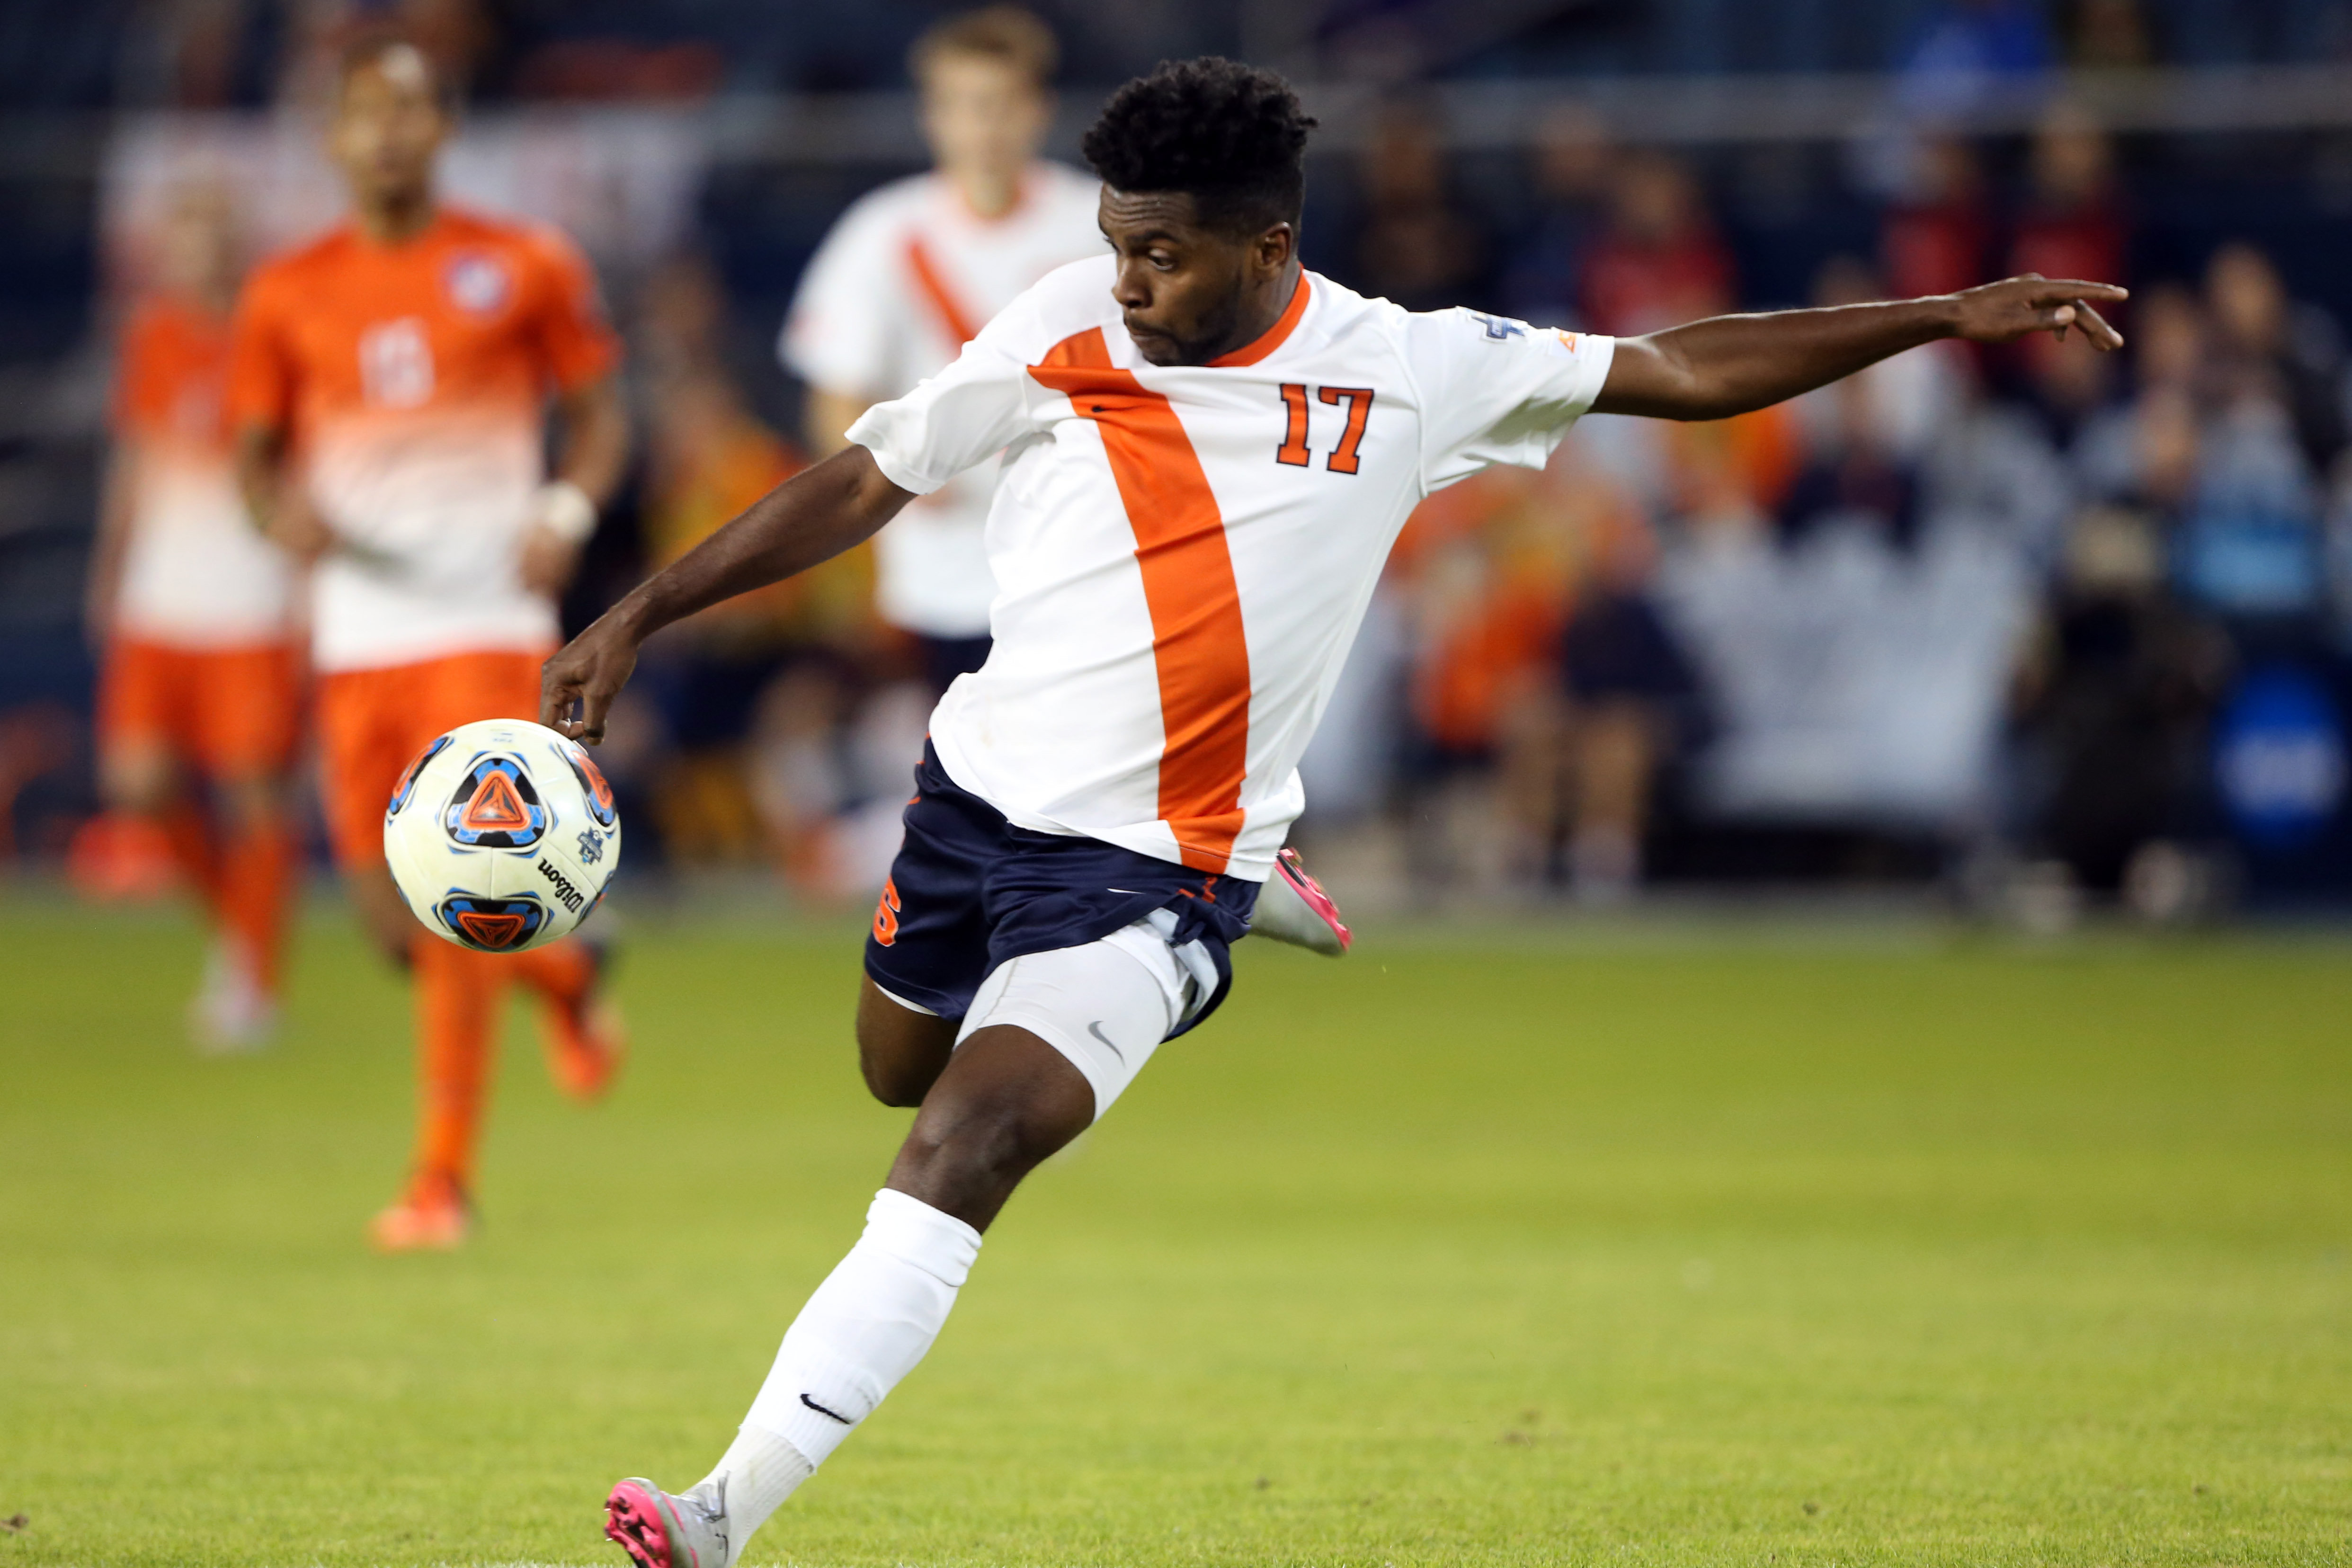 NCAA SOCCER: DEC 11 Men's College Cup - Clemson v Syracuse